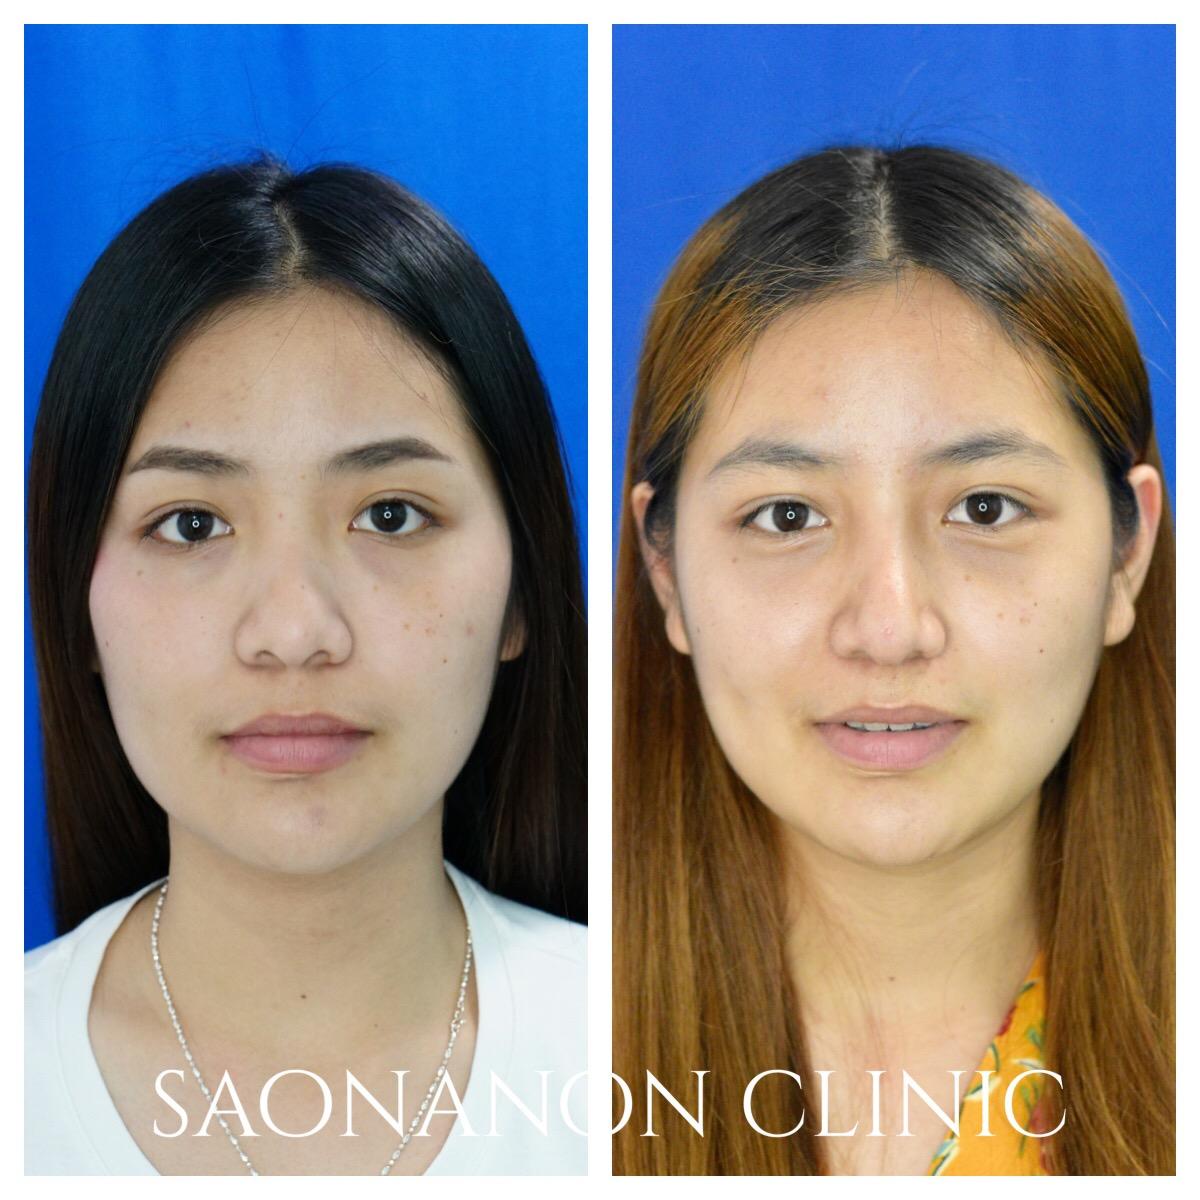 Blunt tip and large nasal bone